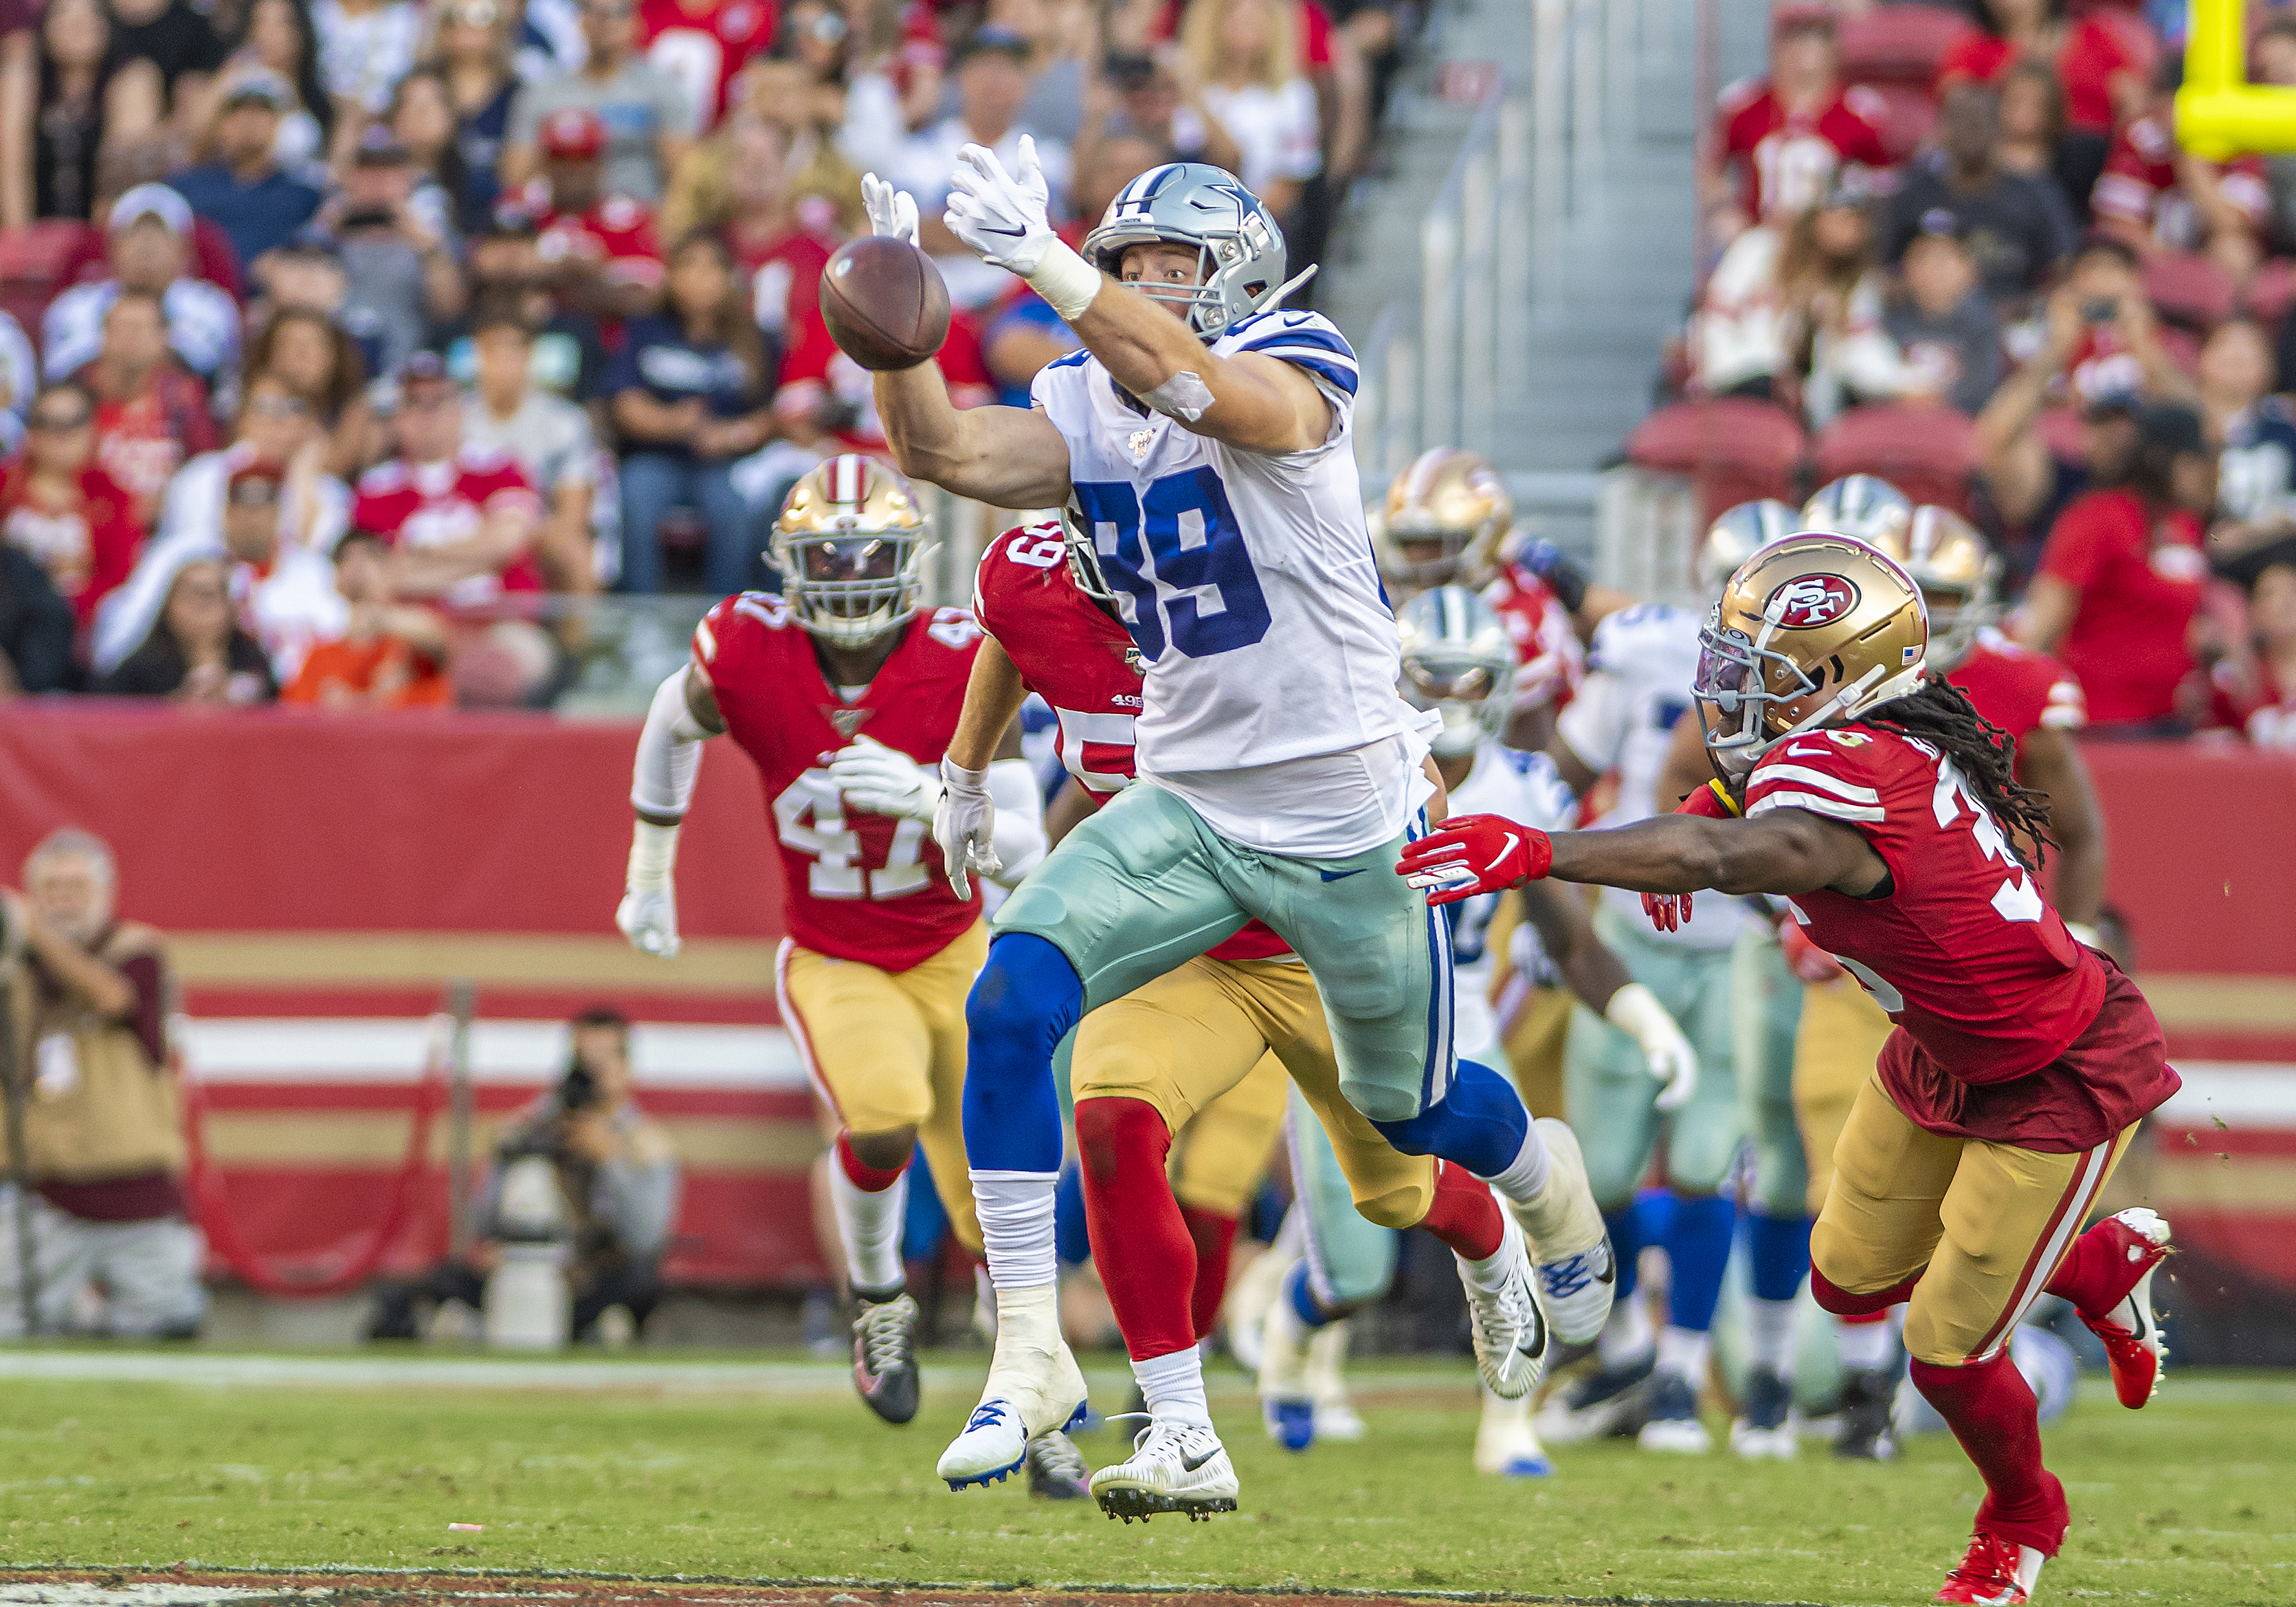 NFL: AUG 10 Preseason - Cowboys at 49ers